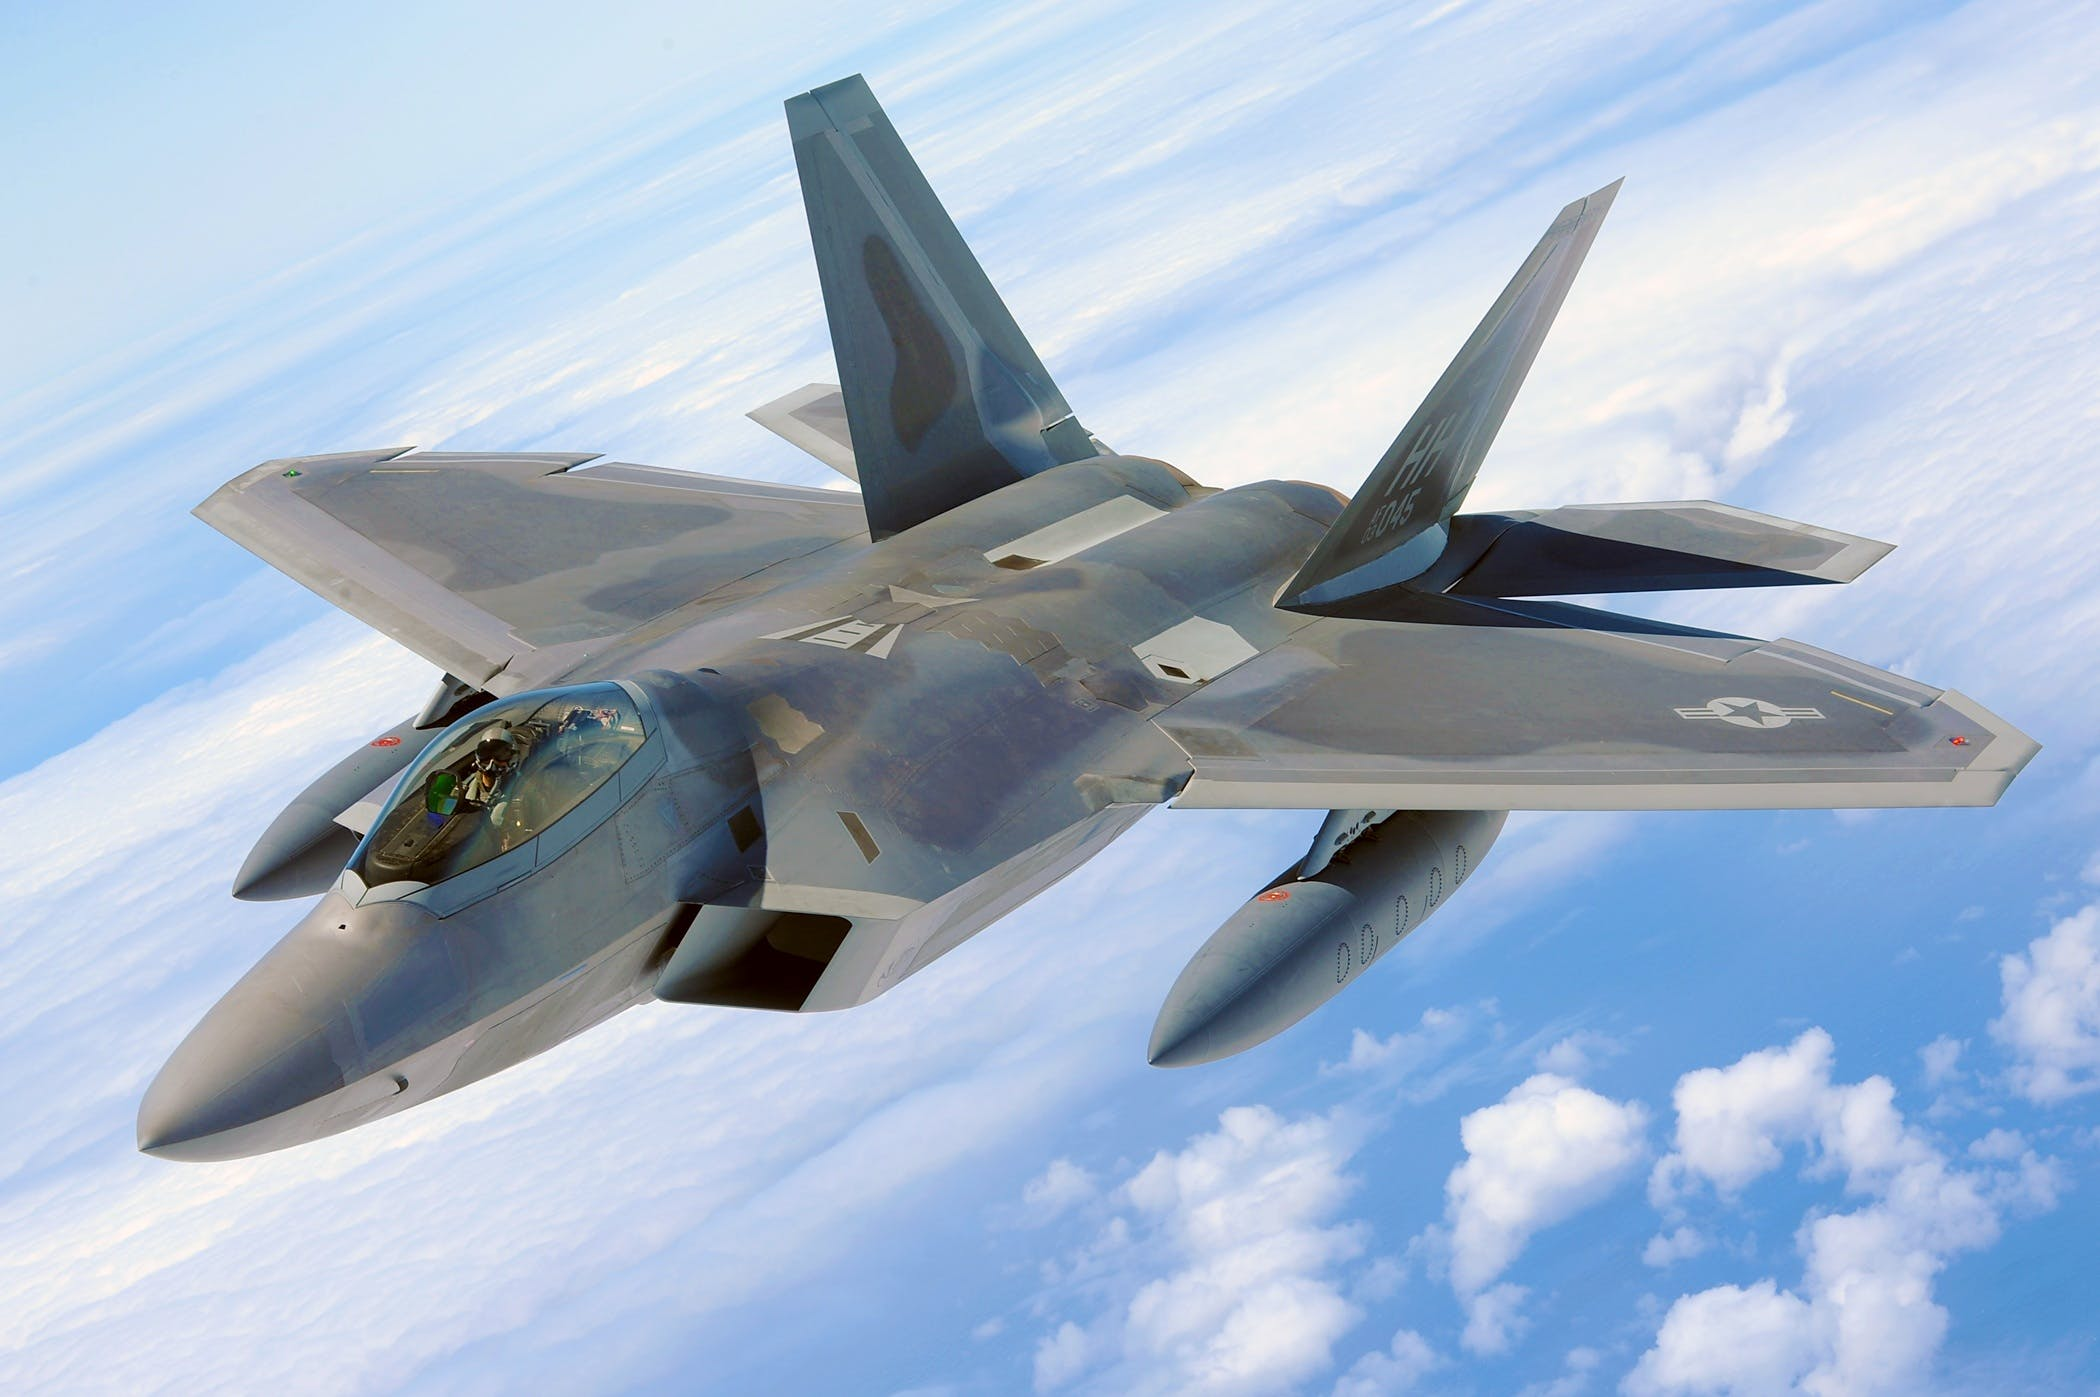 bojovník, f-22, let